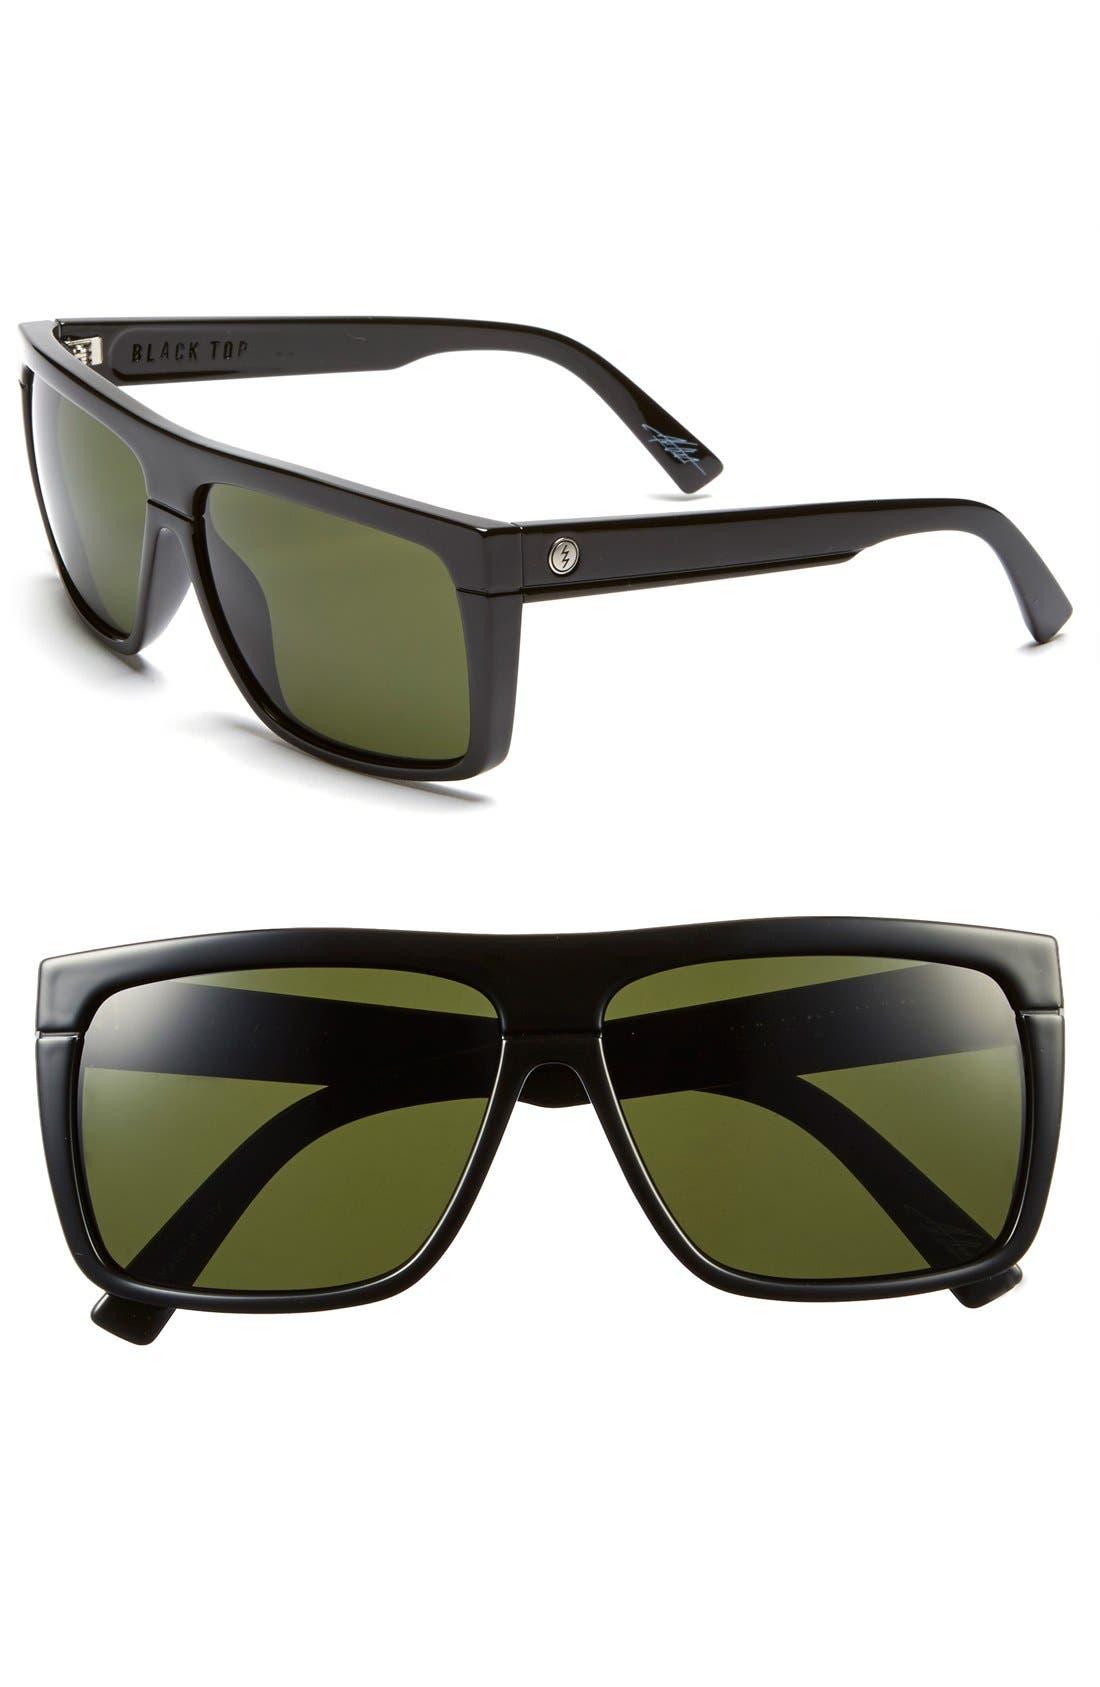 ELECTRIC 'Black Top' 61mm Flat Top Sunglasses